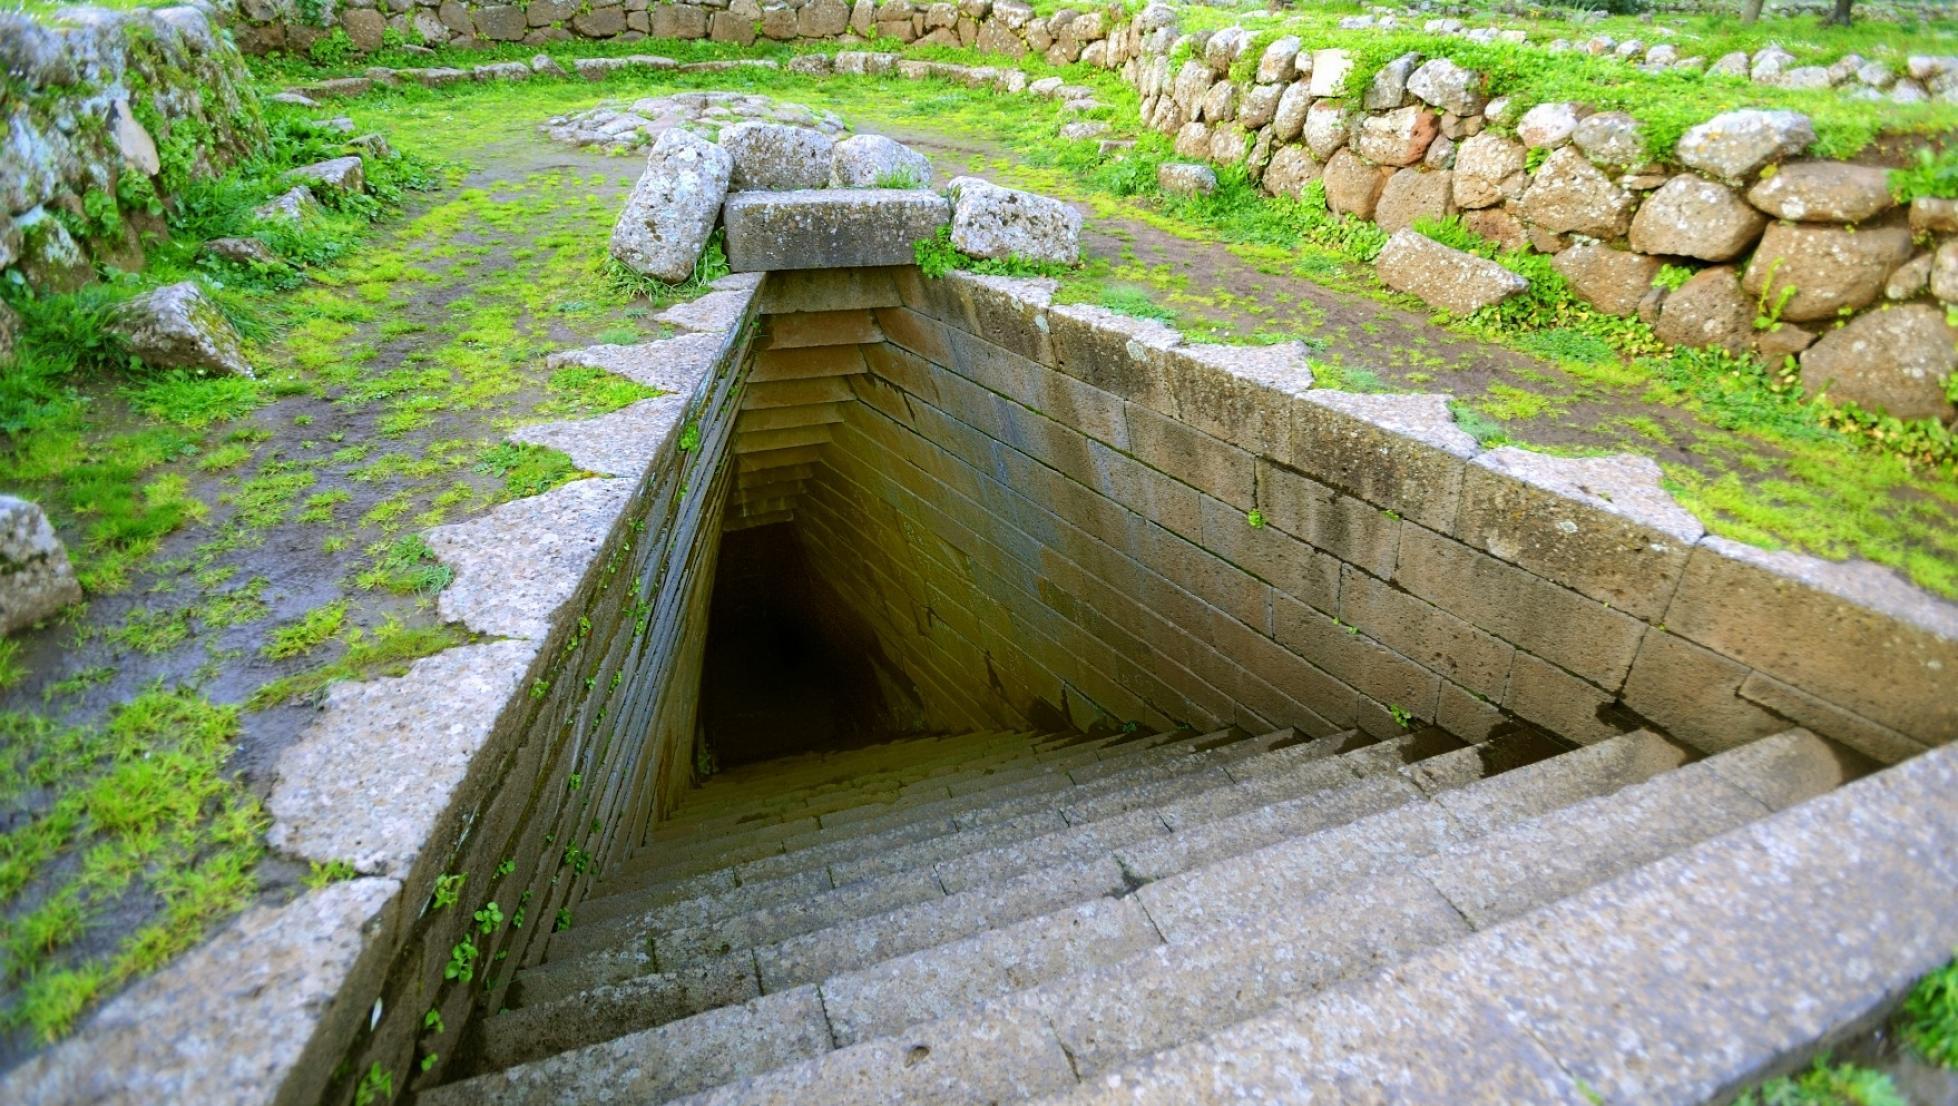 Pozzo sacro di Santa Cristina - Paulilatino